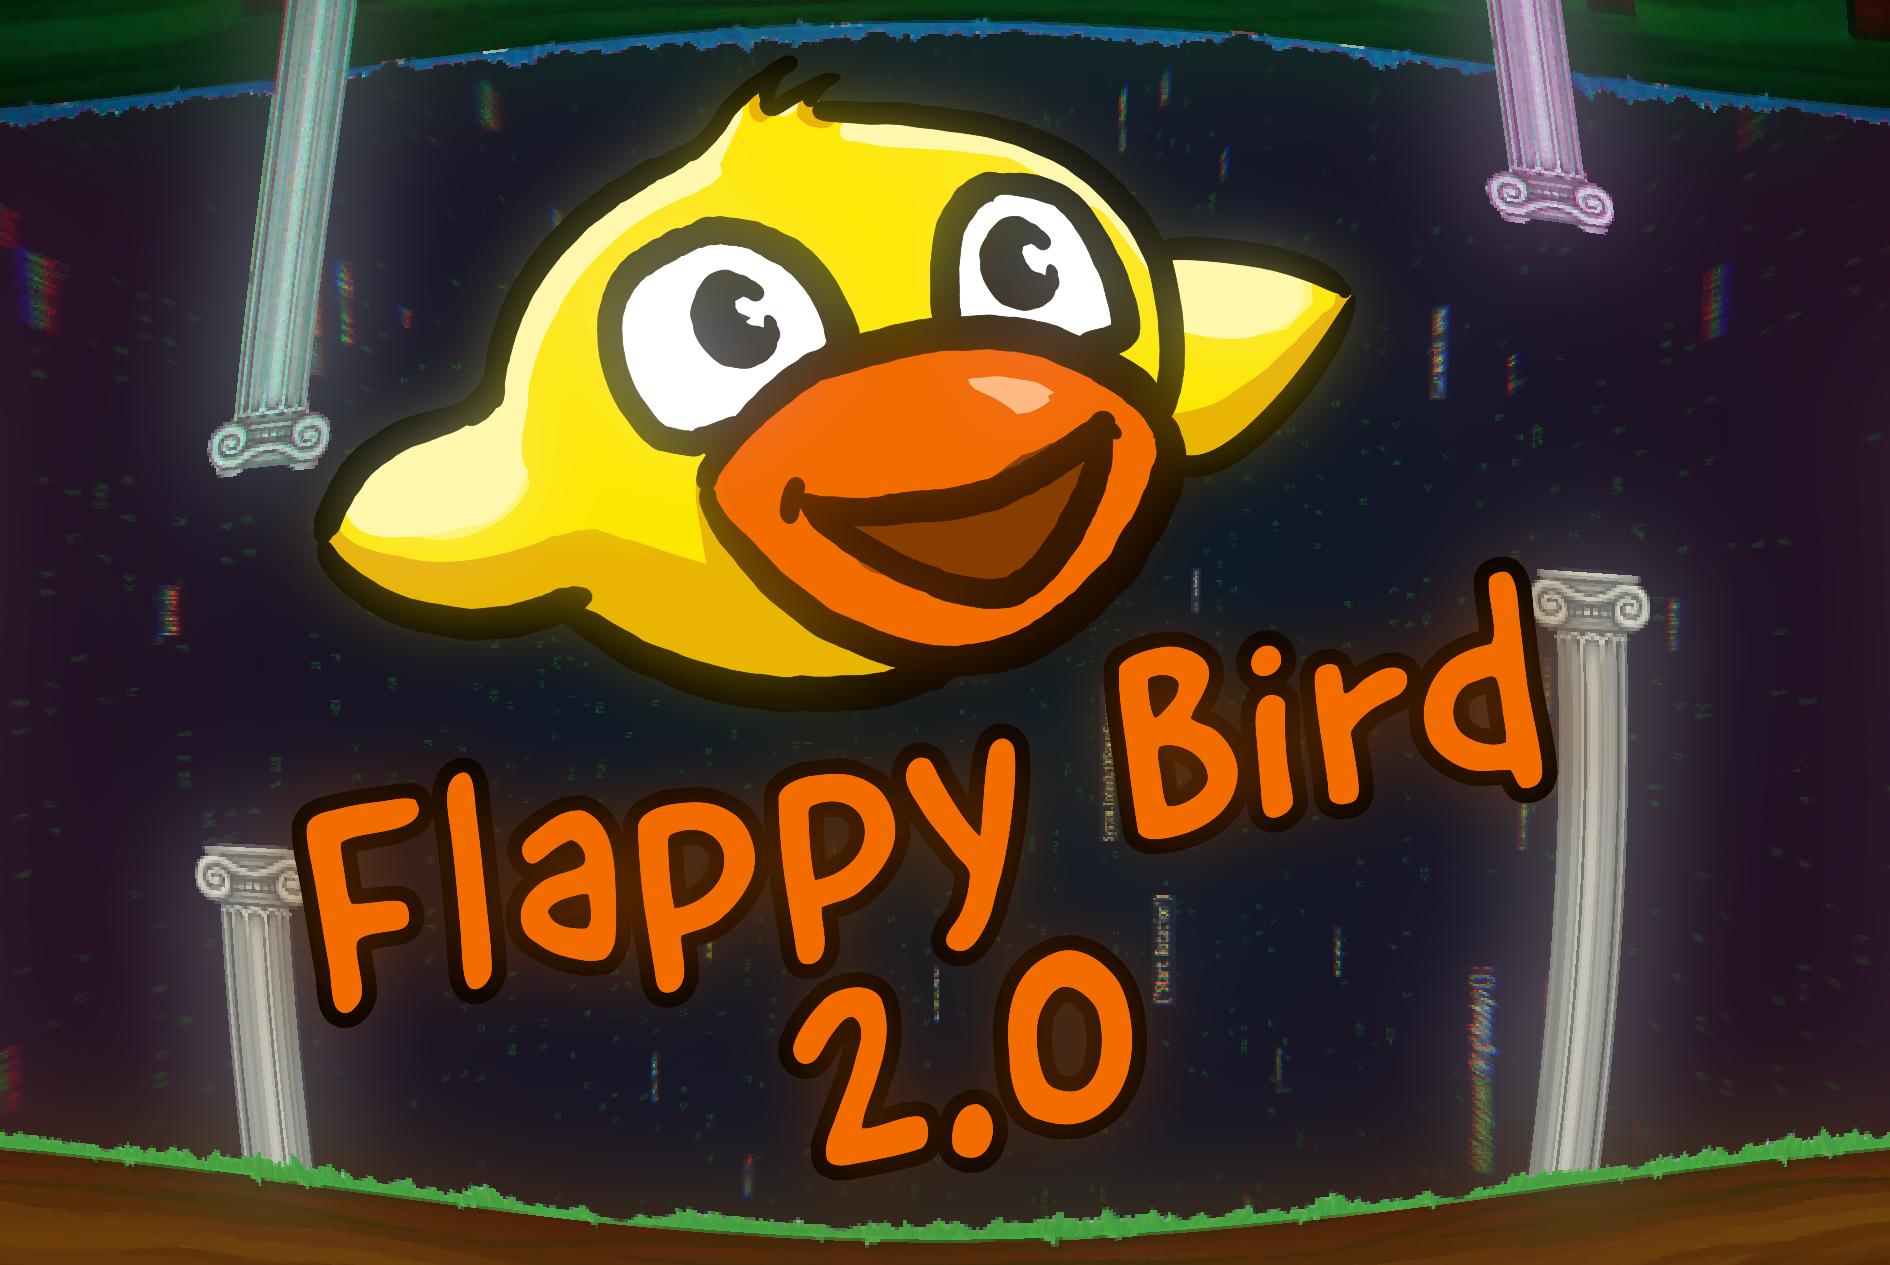 Flappy Bird 2.0!